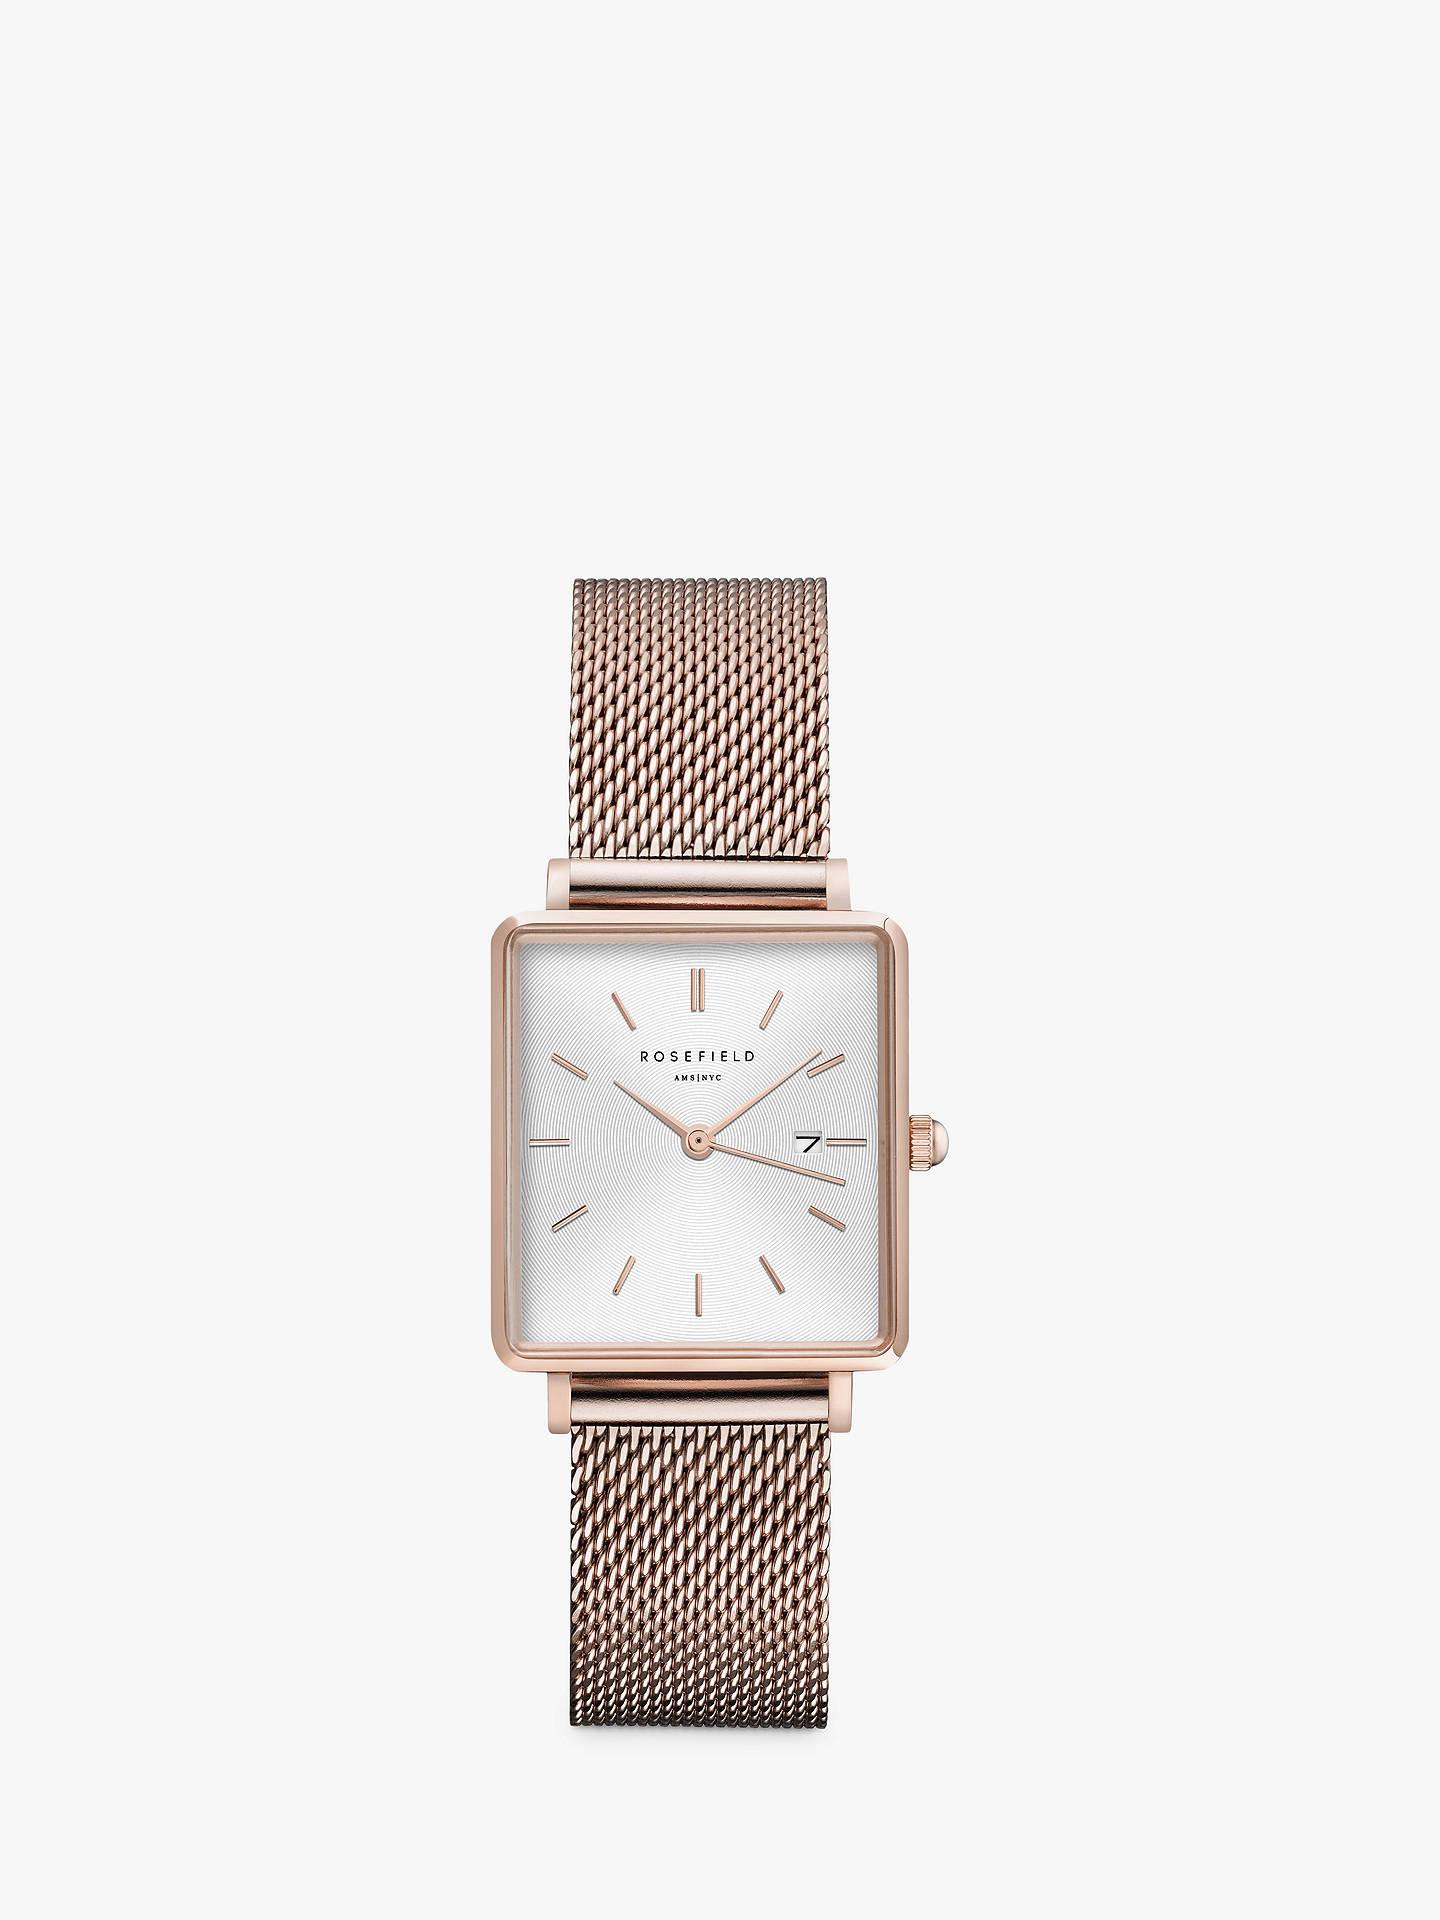 meilleures baskets 8dfde d06b5 ROSEFIELD Women's The Boxy Date Mesh Bracelet Strap Watch, Rose Gold/White  QWSR-Q01